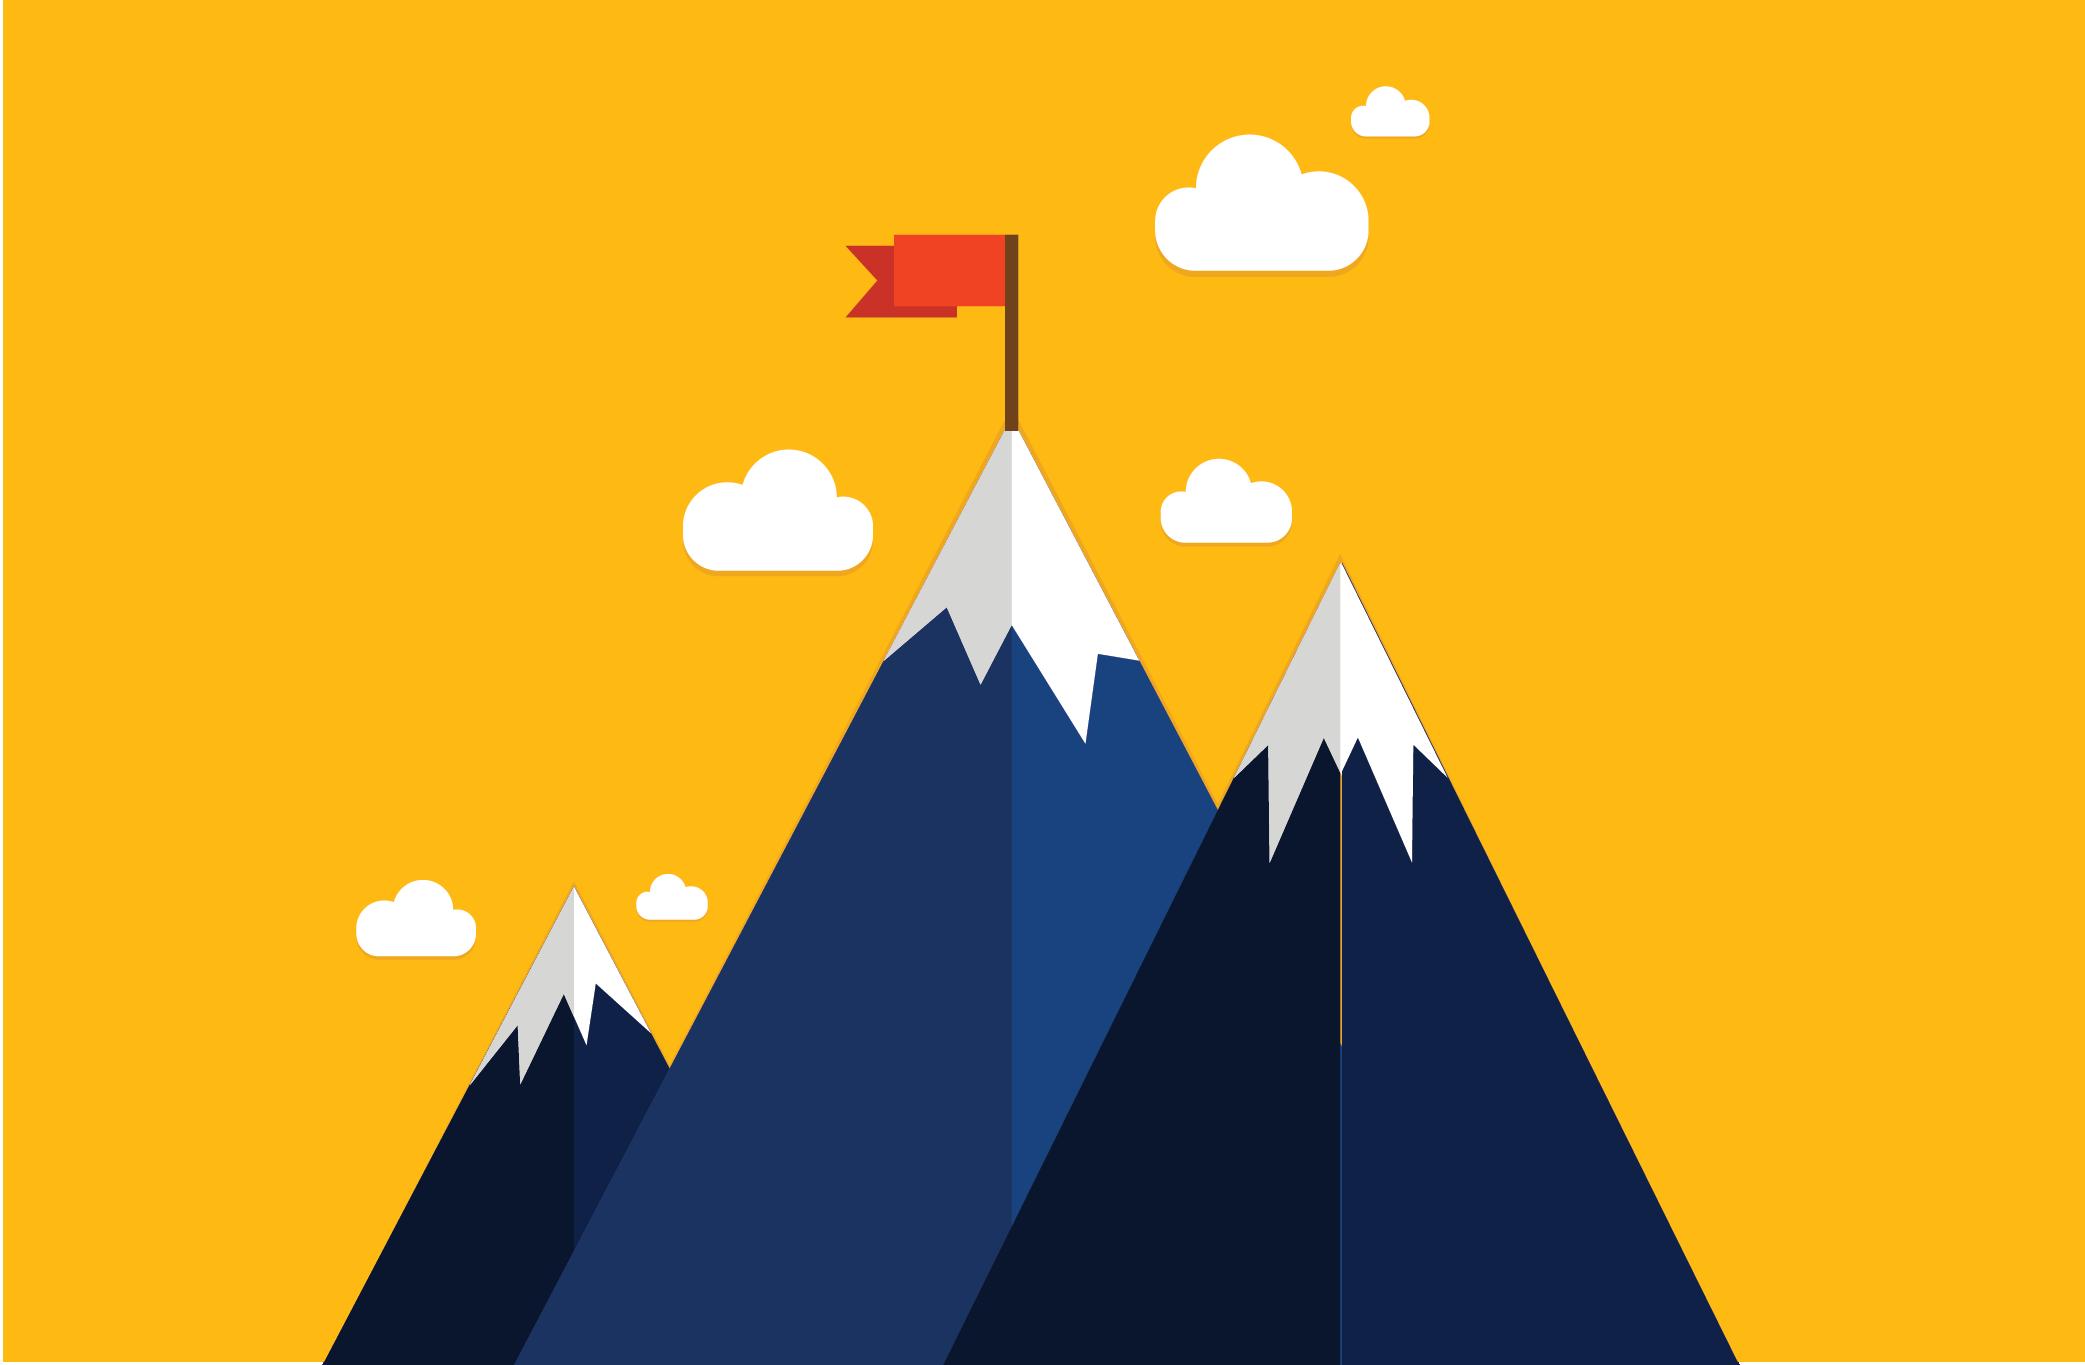 10.09.15-vendor-management-challenges-FEATURED-808307-edited